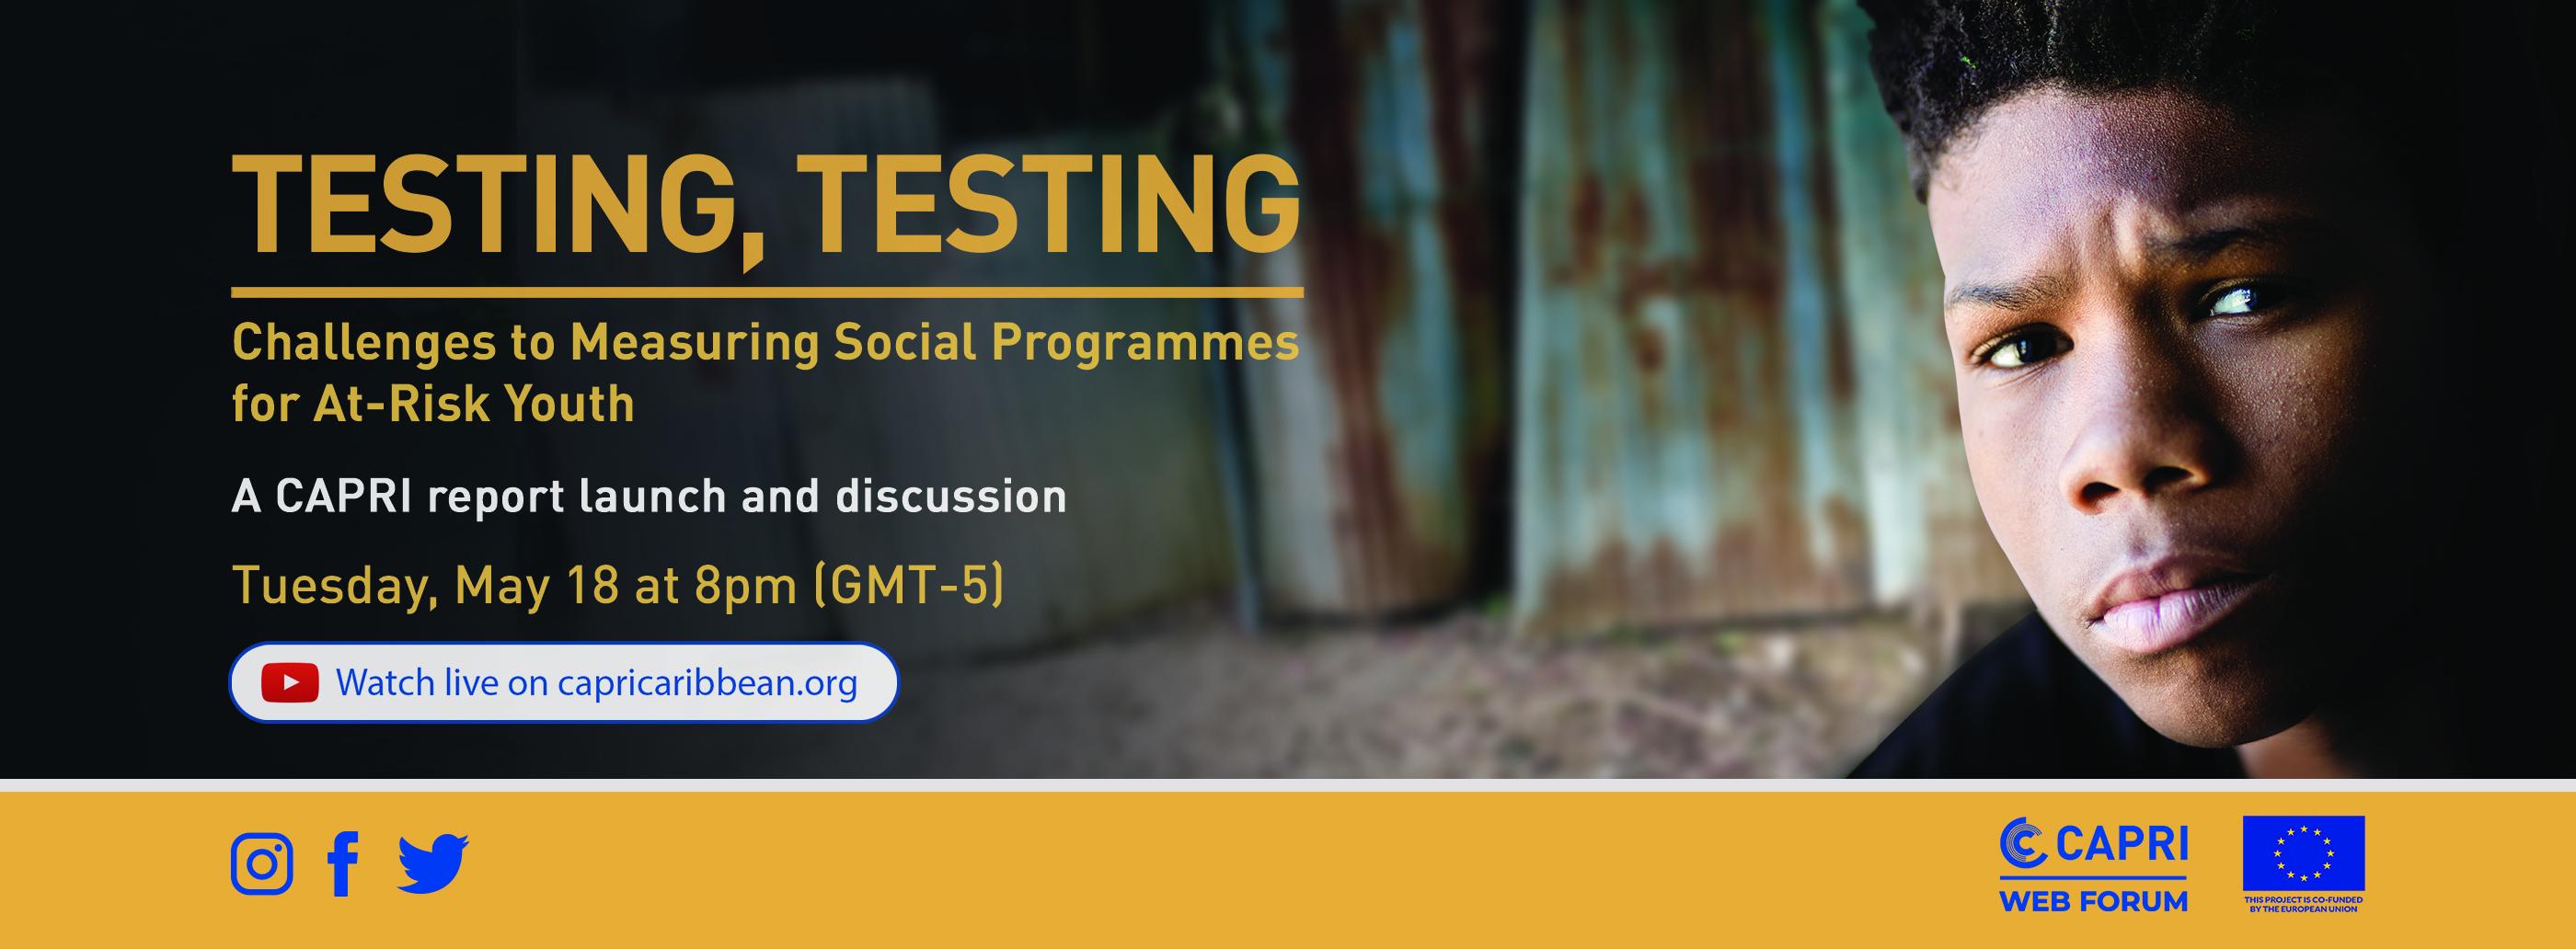 capri_unatttached_youth_testing_testing_web_banner.jpg